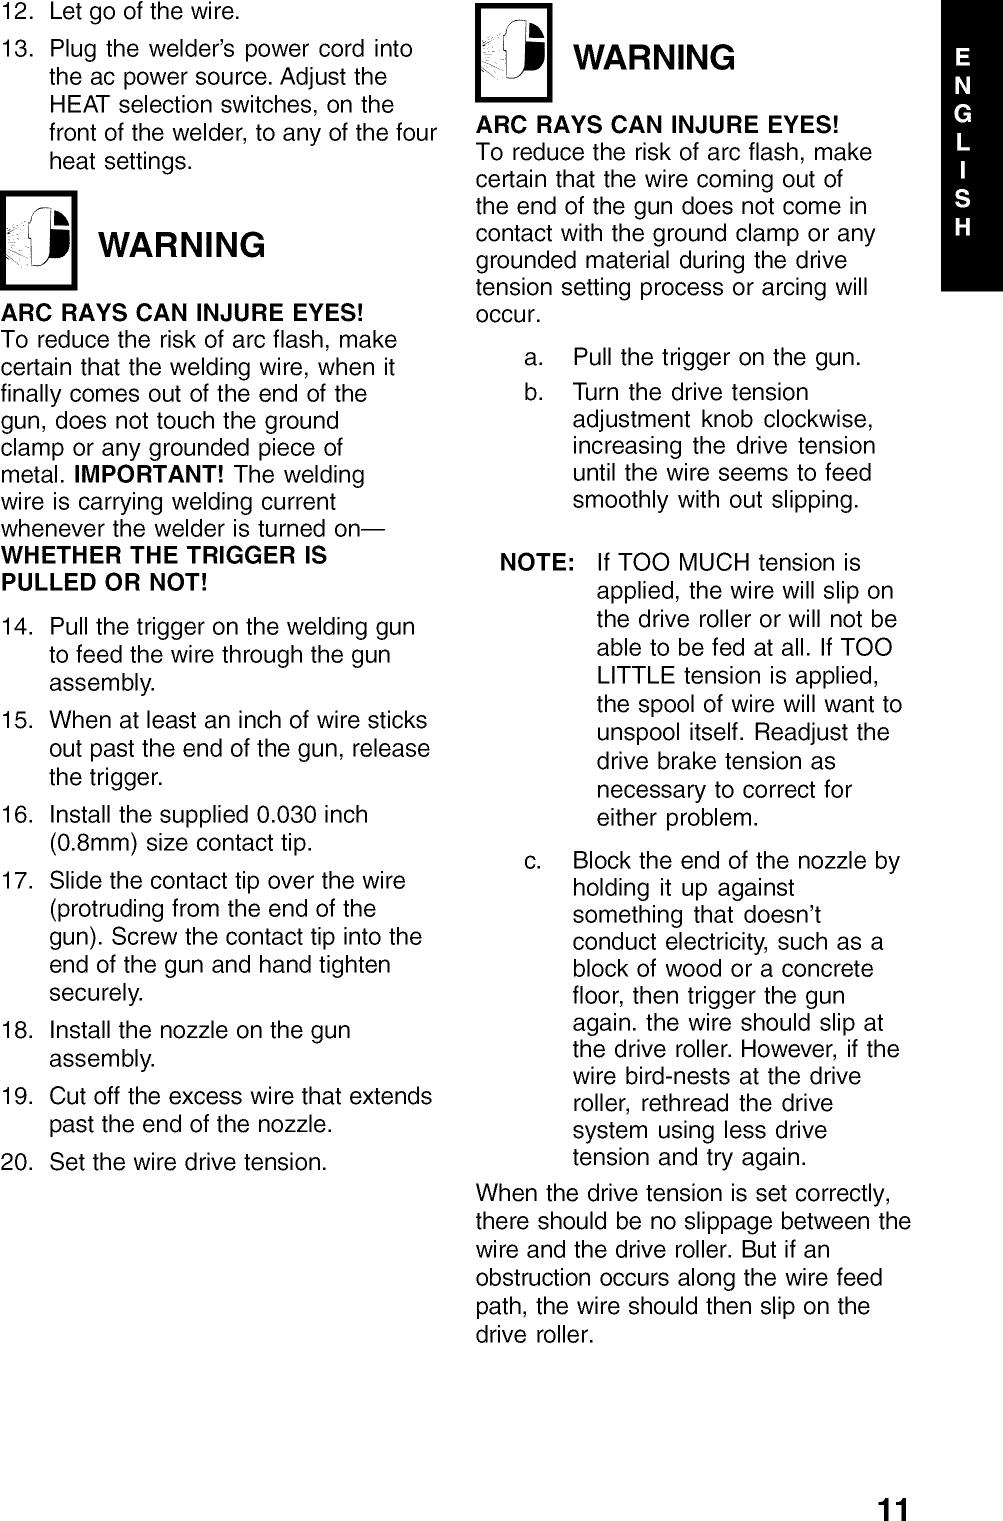 Century 117 071 User Manual MIG WELDER 1999 Manuals And